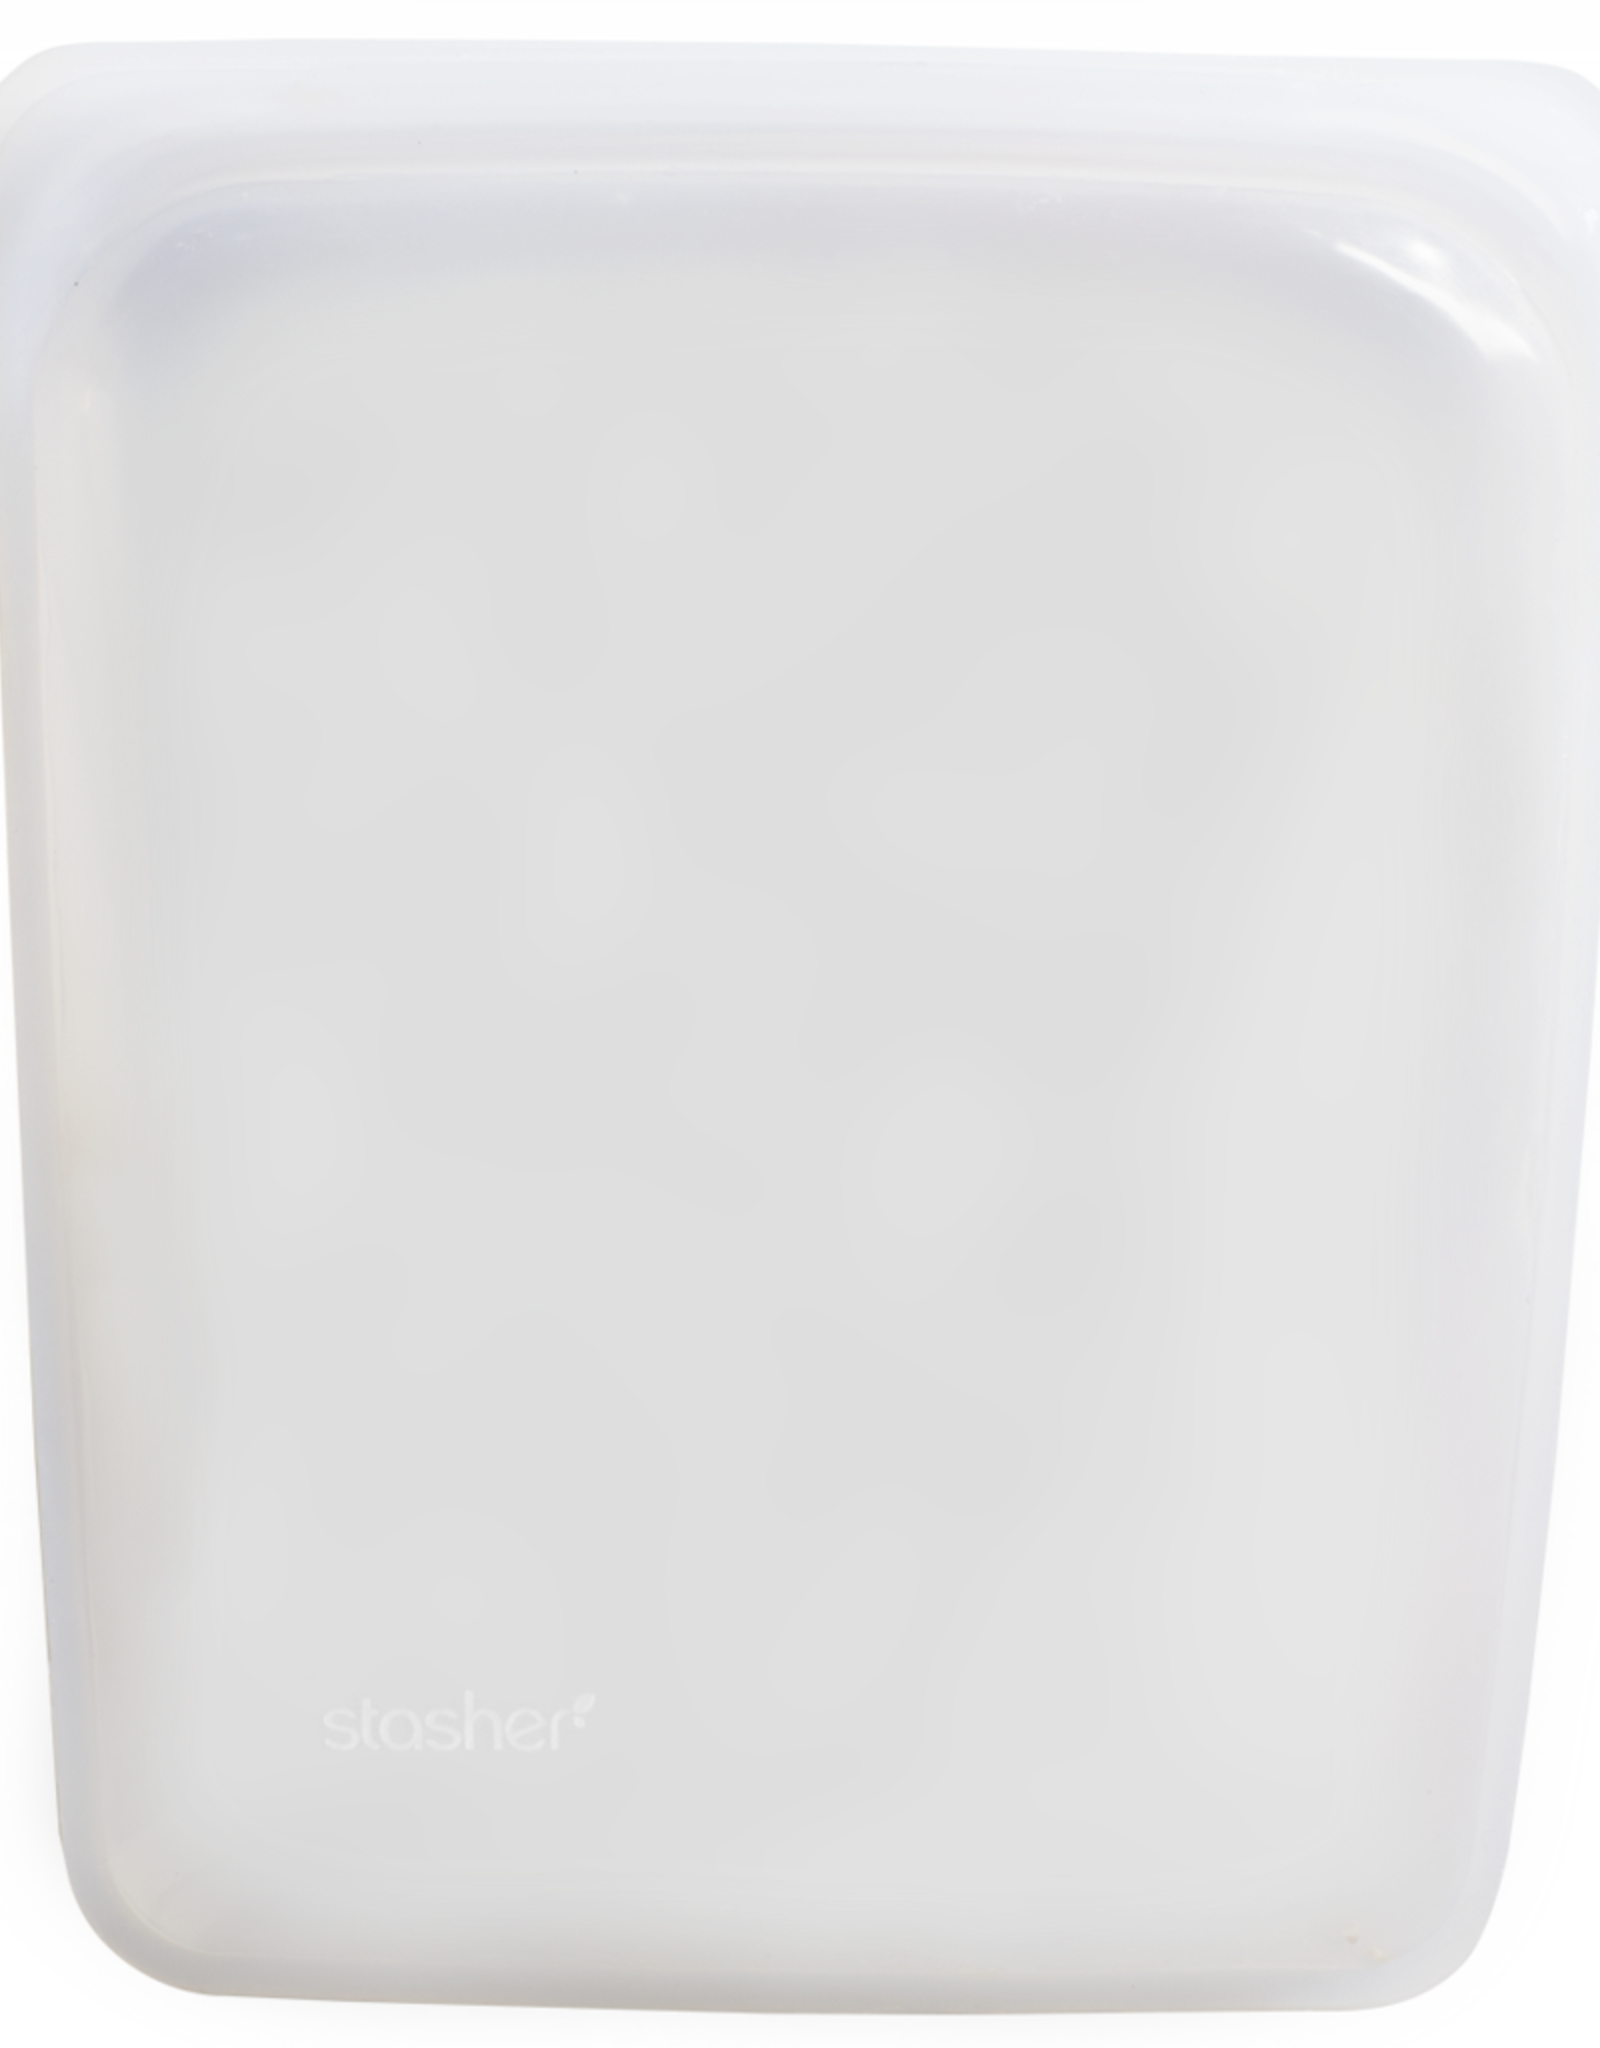 Stasher Bag Stasher bag Large - Clear